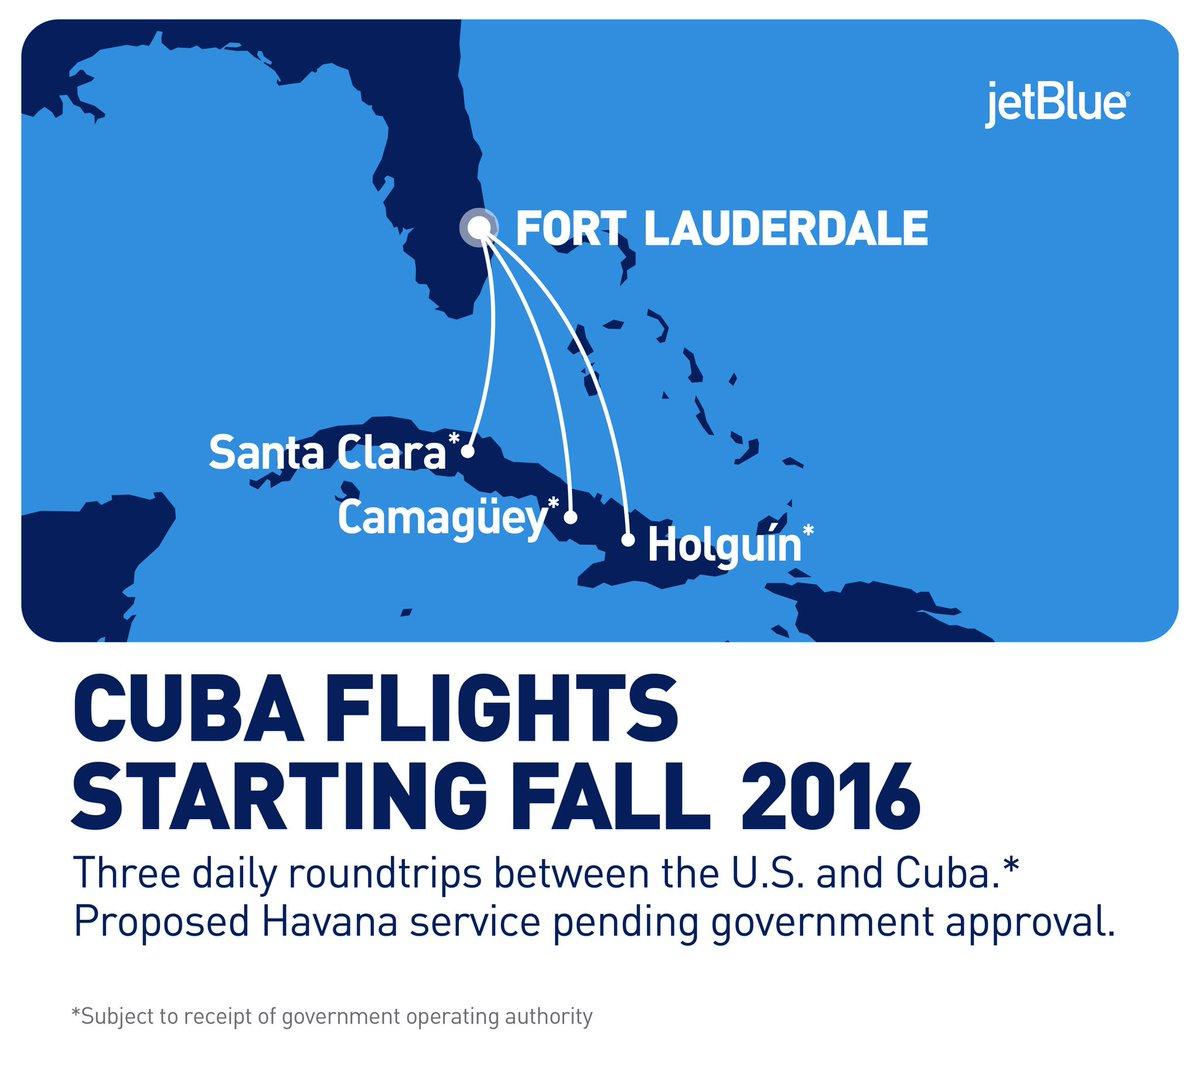 Hola, Cuba! 👏🏻👏🏻👏🏻